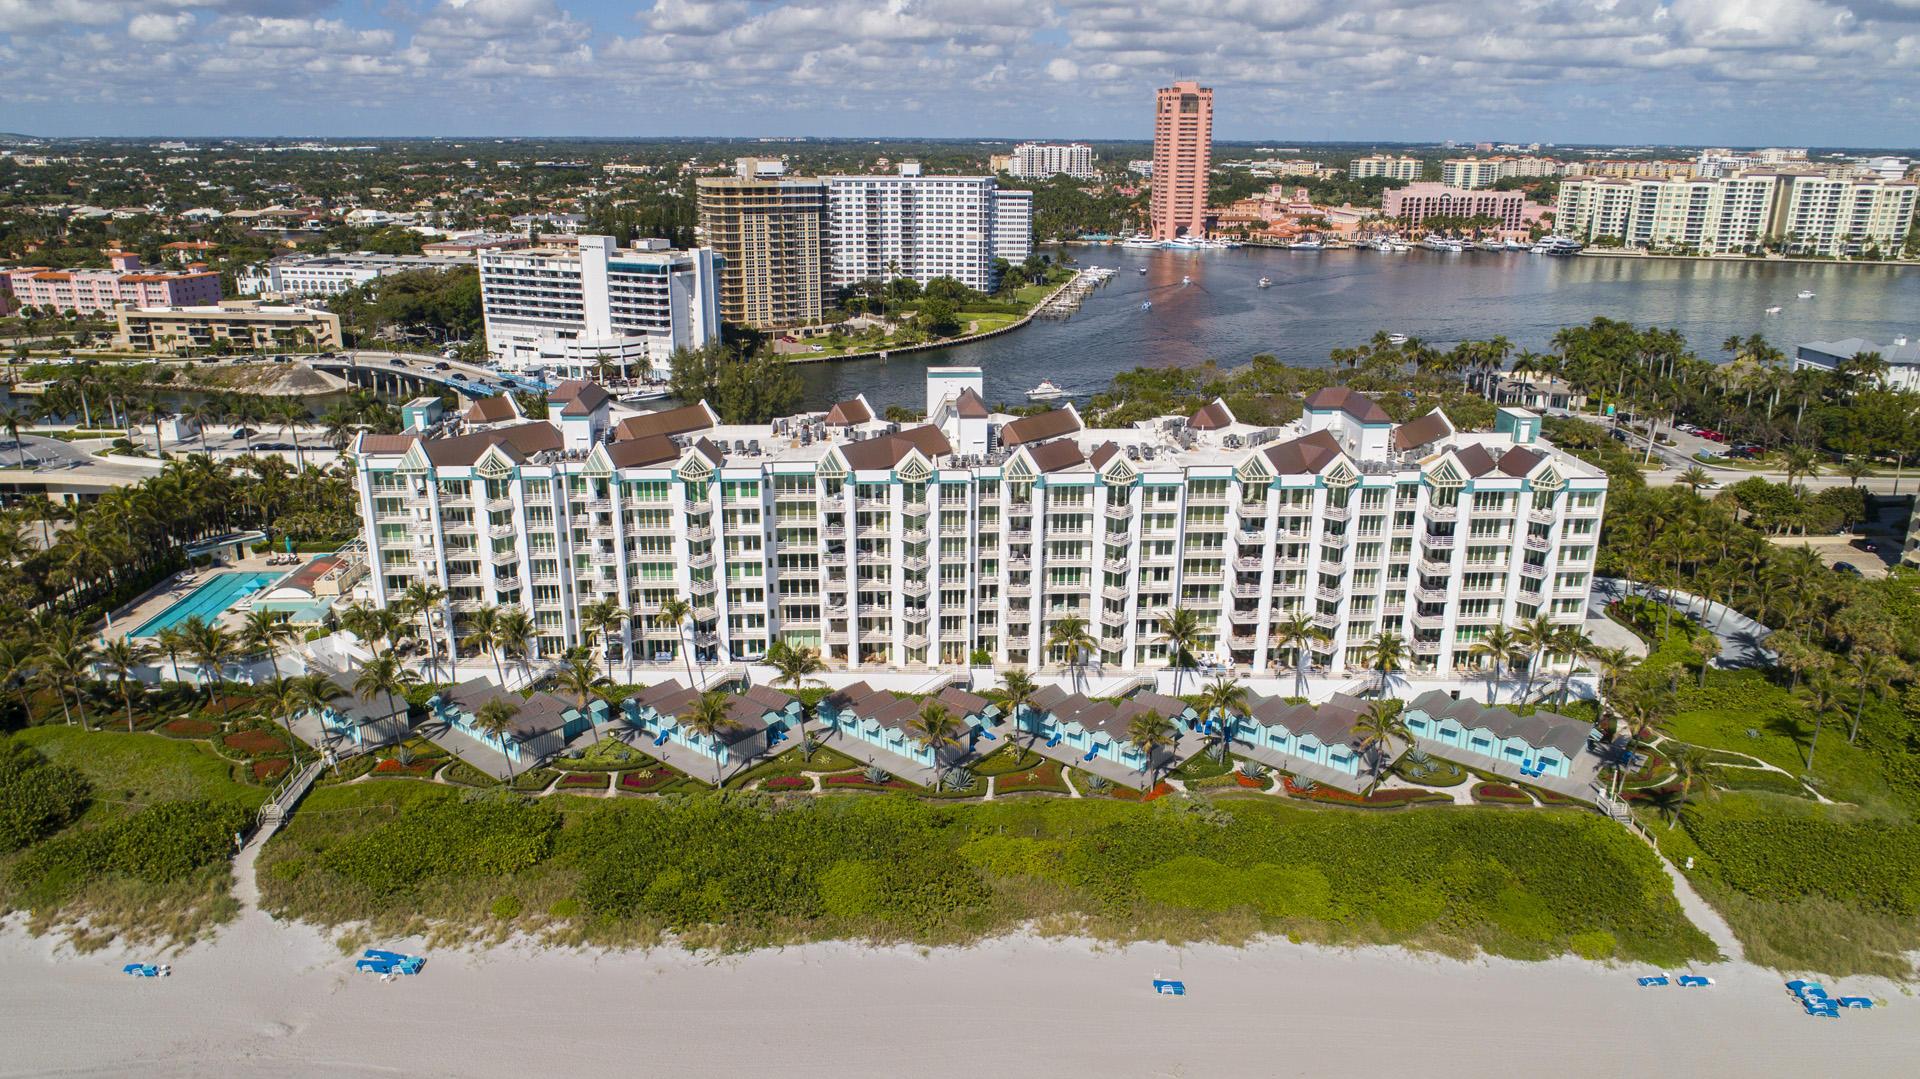 800 S Ocean Boulevard Boca Raton FL 33432